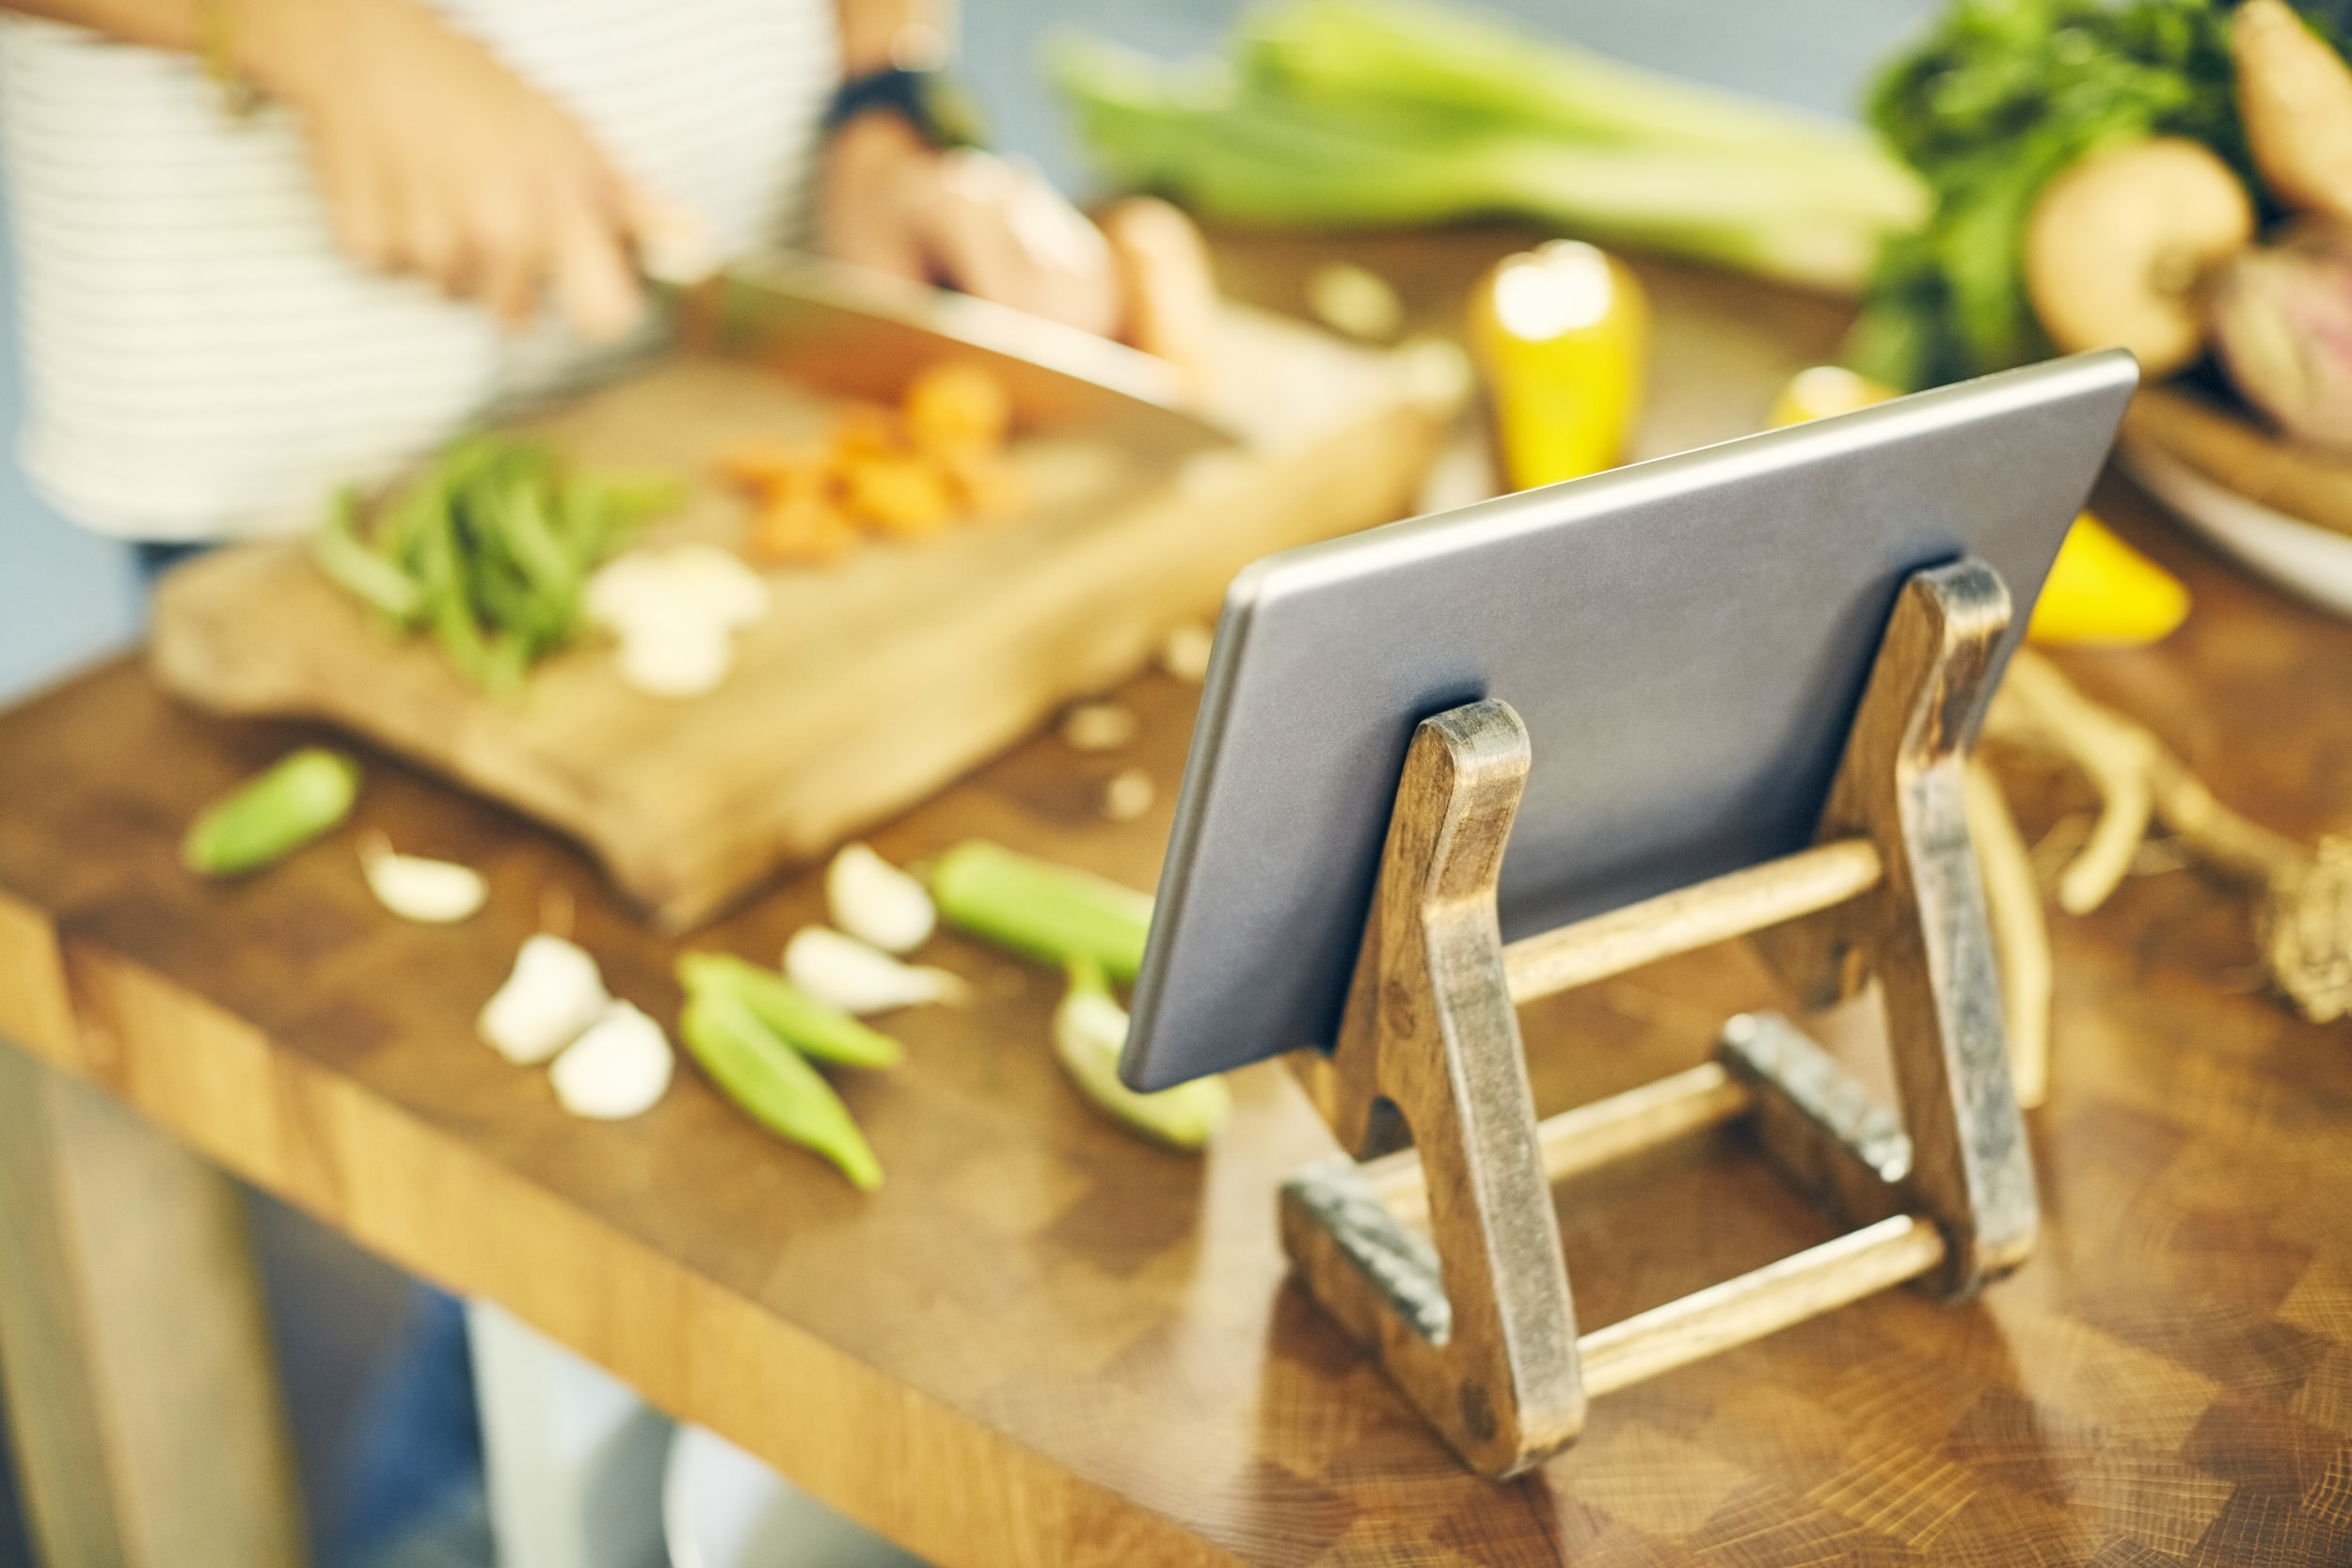 Cooking with iPad.jpg